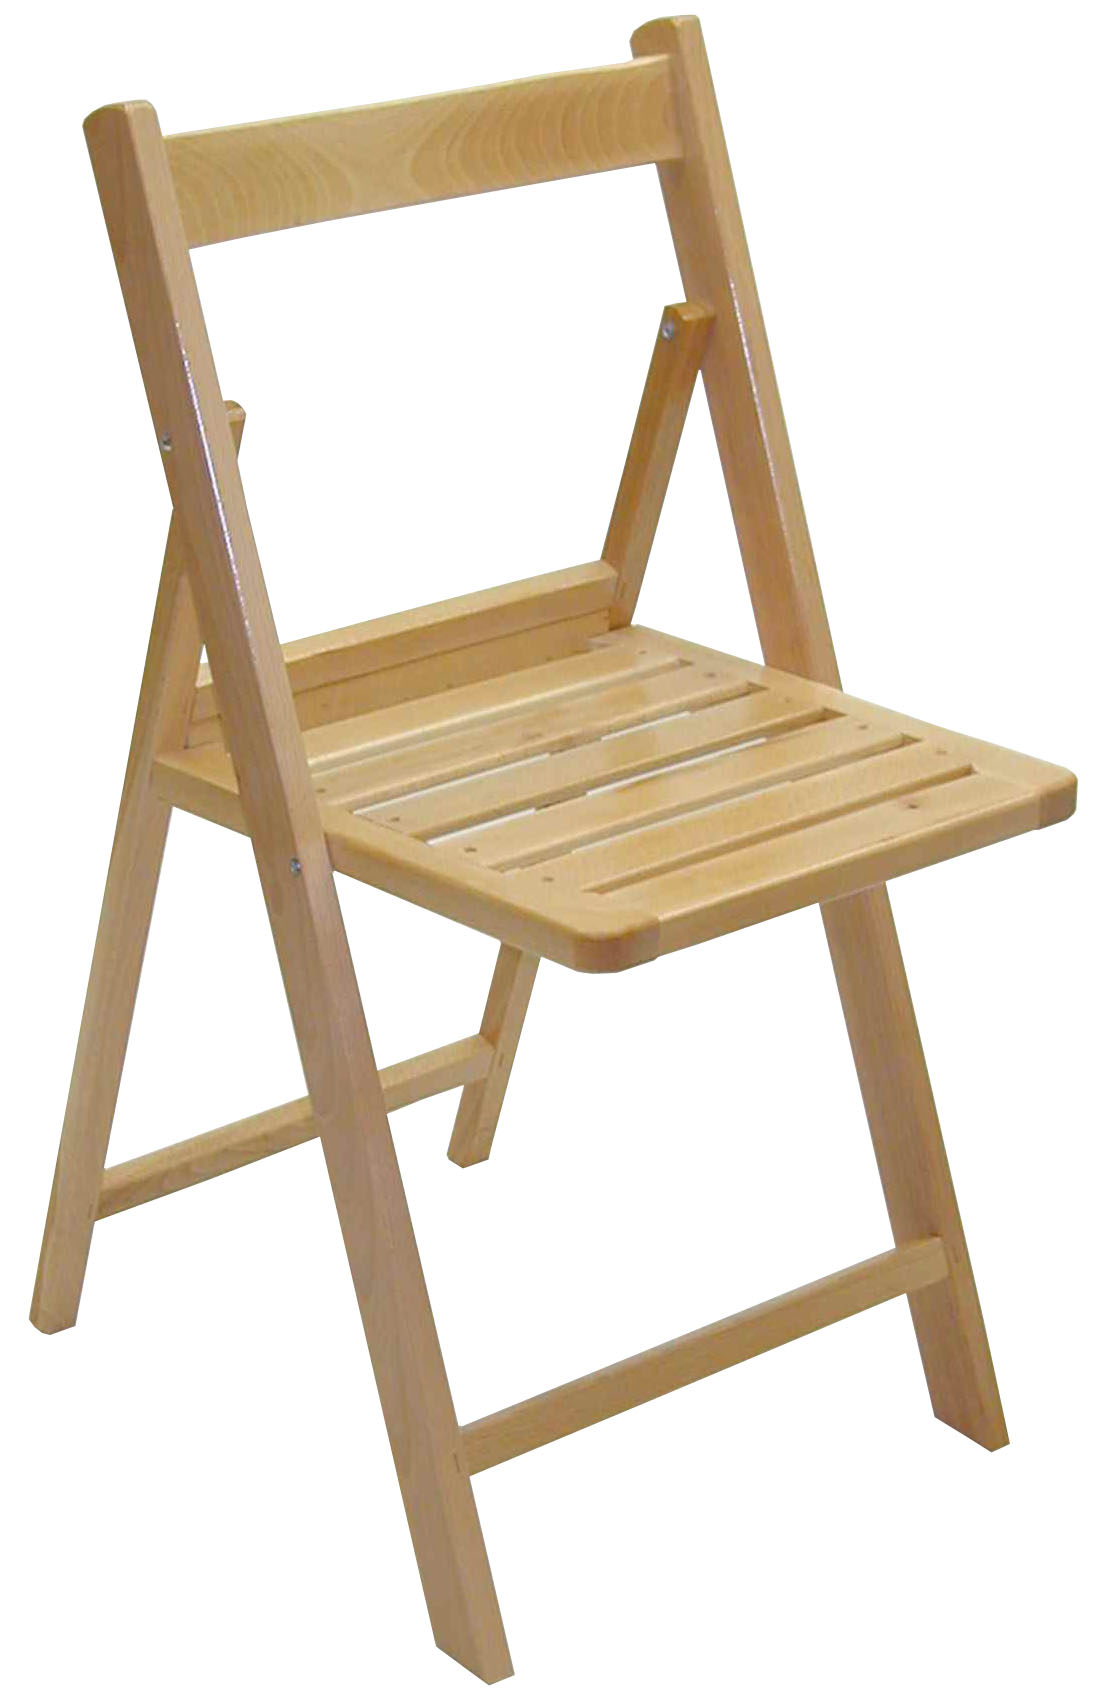 Mesa Plegable De Melanina Con Patas Abatibles De 200×80 # Muebles Plegables